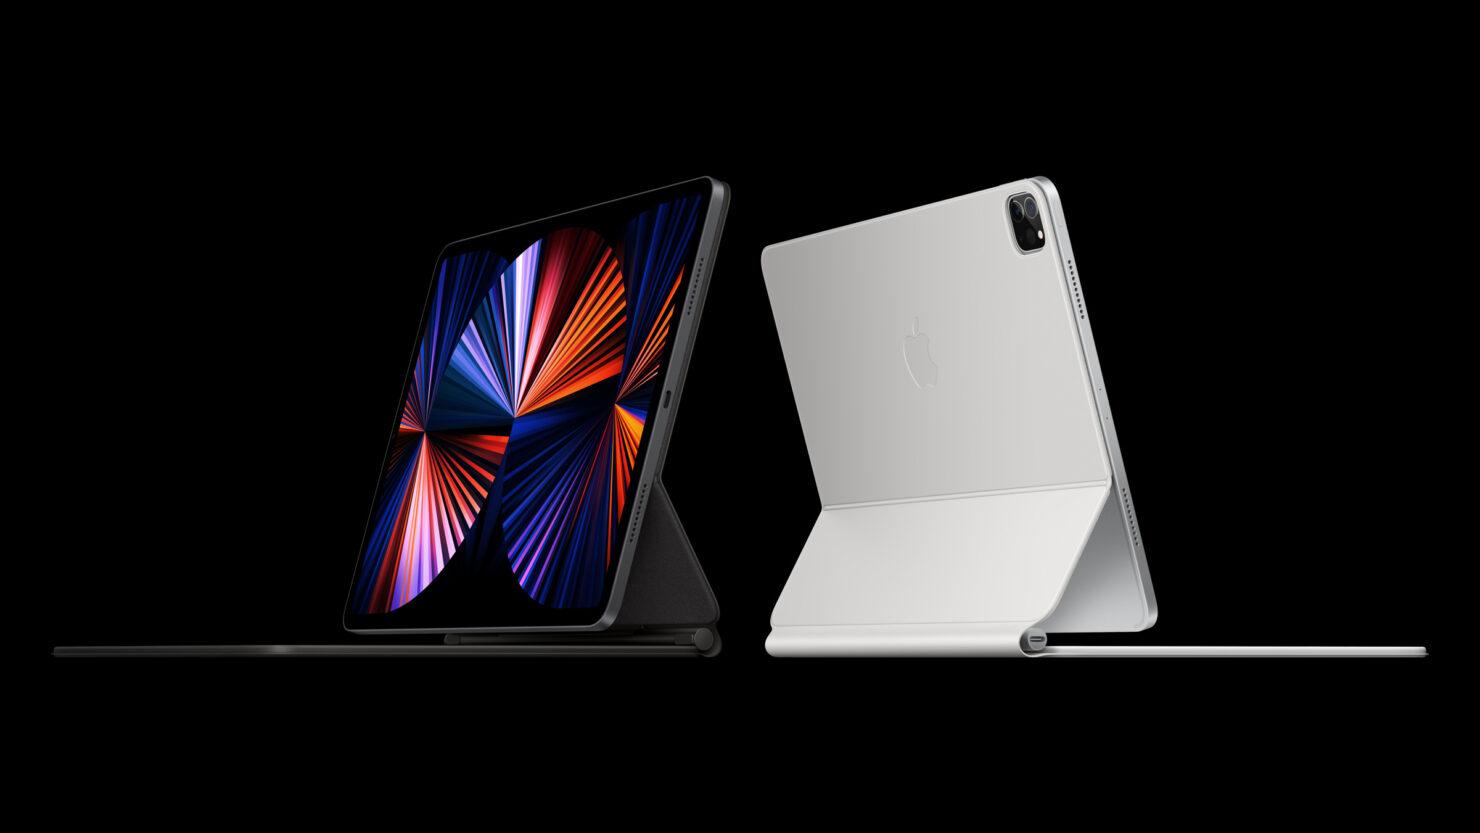 new-2021-12-9-inch-ipad-pro-1-2